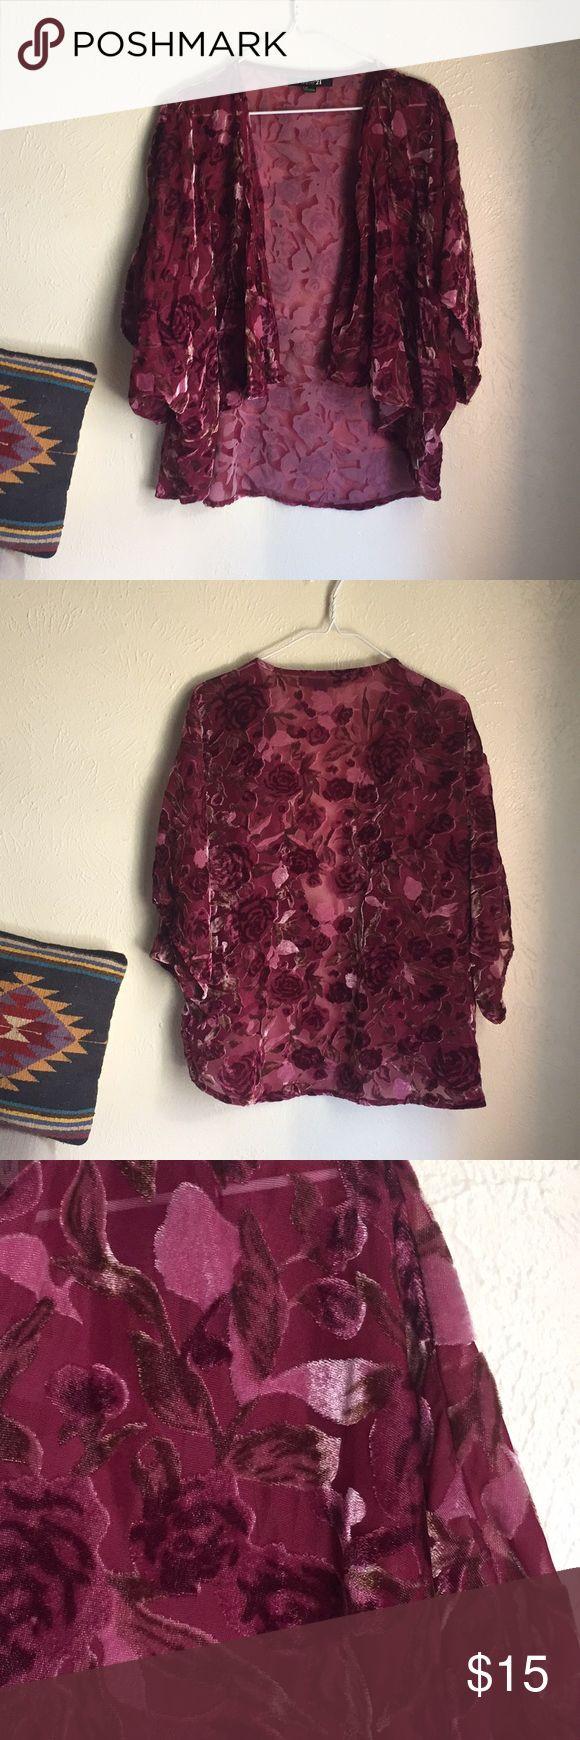 Forever 21 kimono Forever 21 velvet rose kimono. Pink/maroonish roses. Like new condition. Size Large. Forever 21 Sweaters